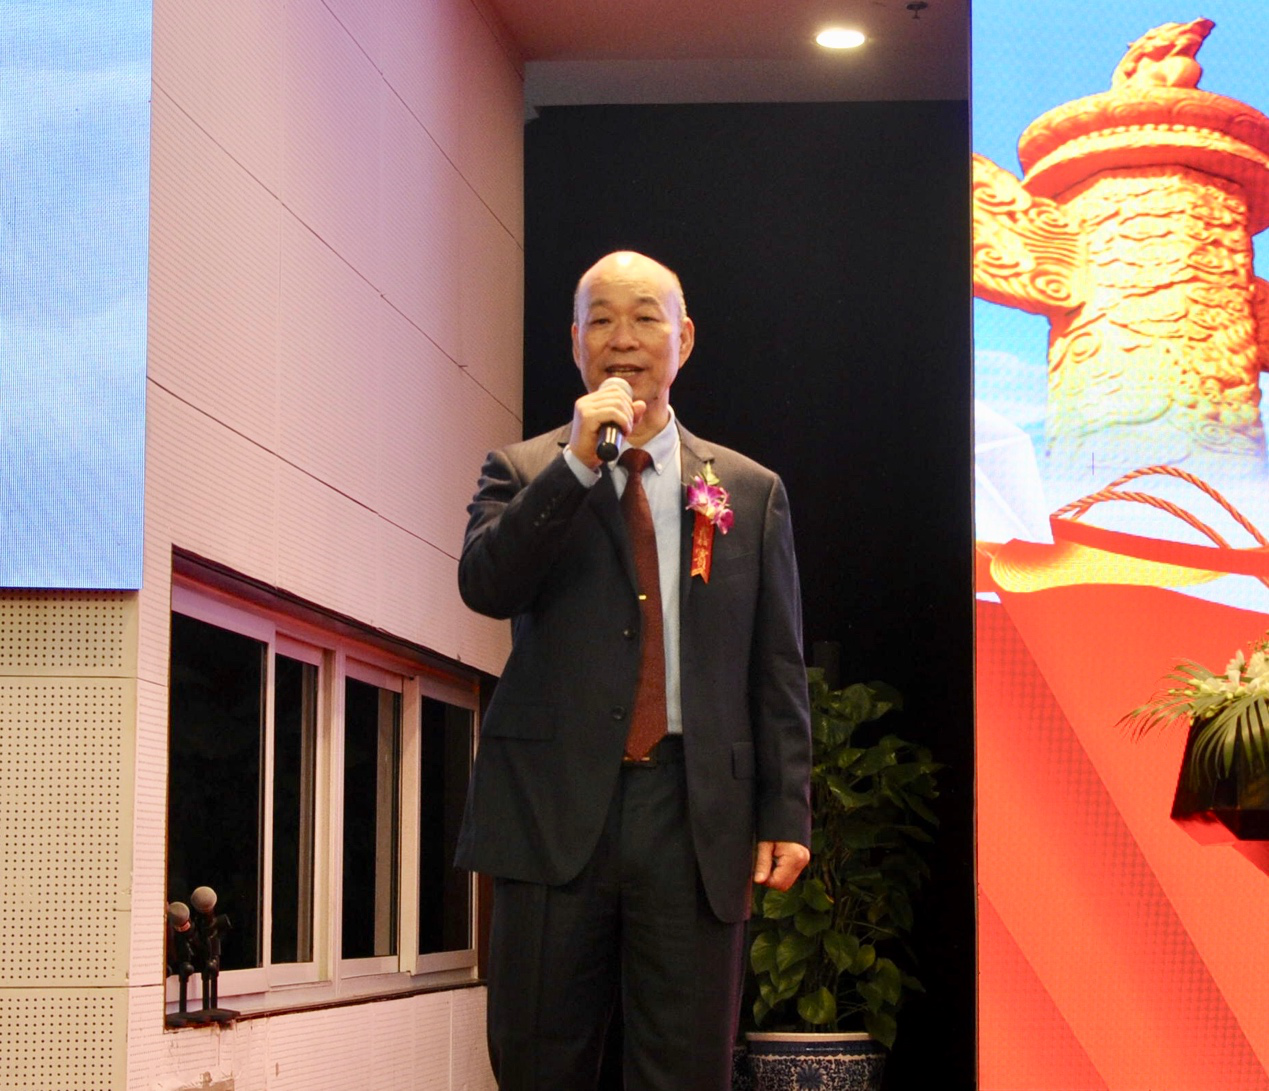 <b>寻找无名烈士活动启动仪式在京举行</b>